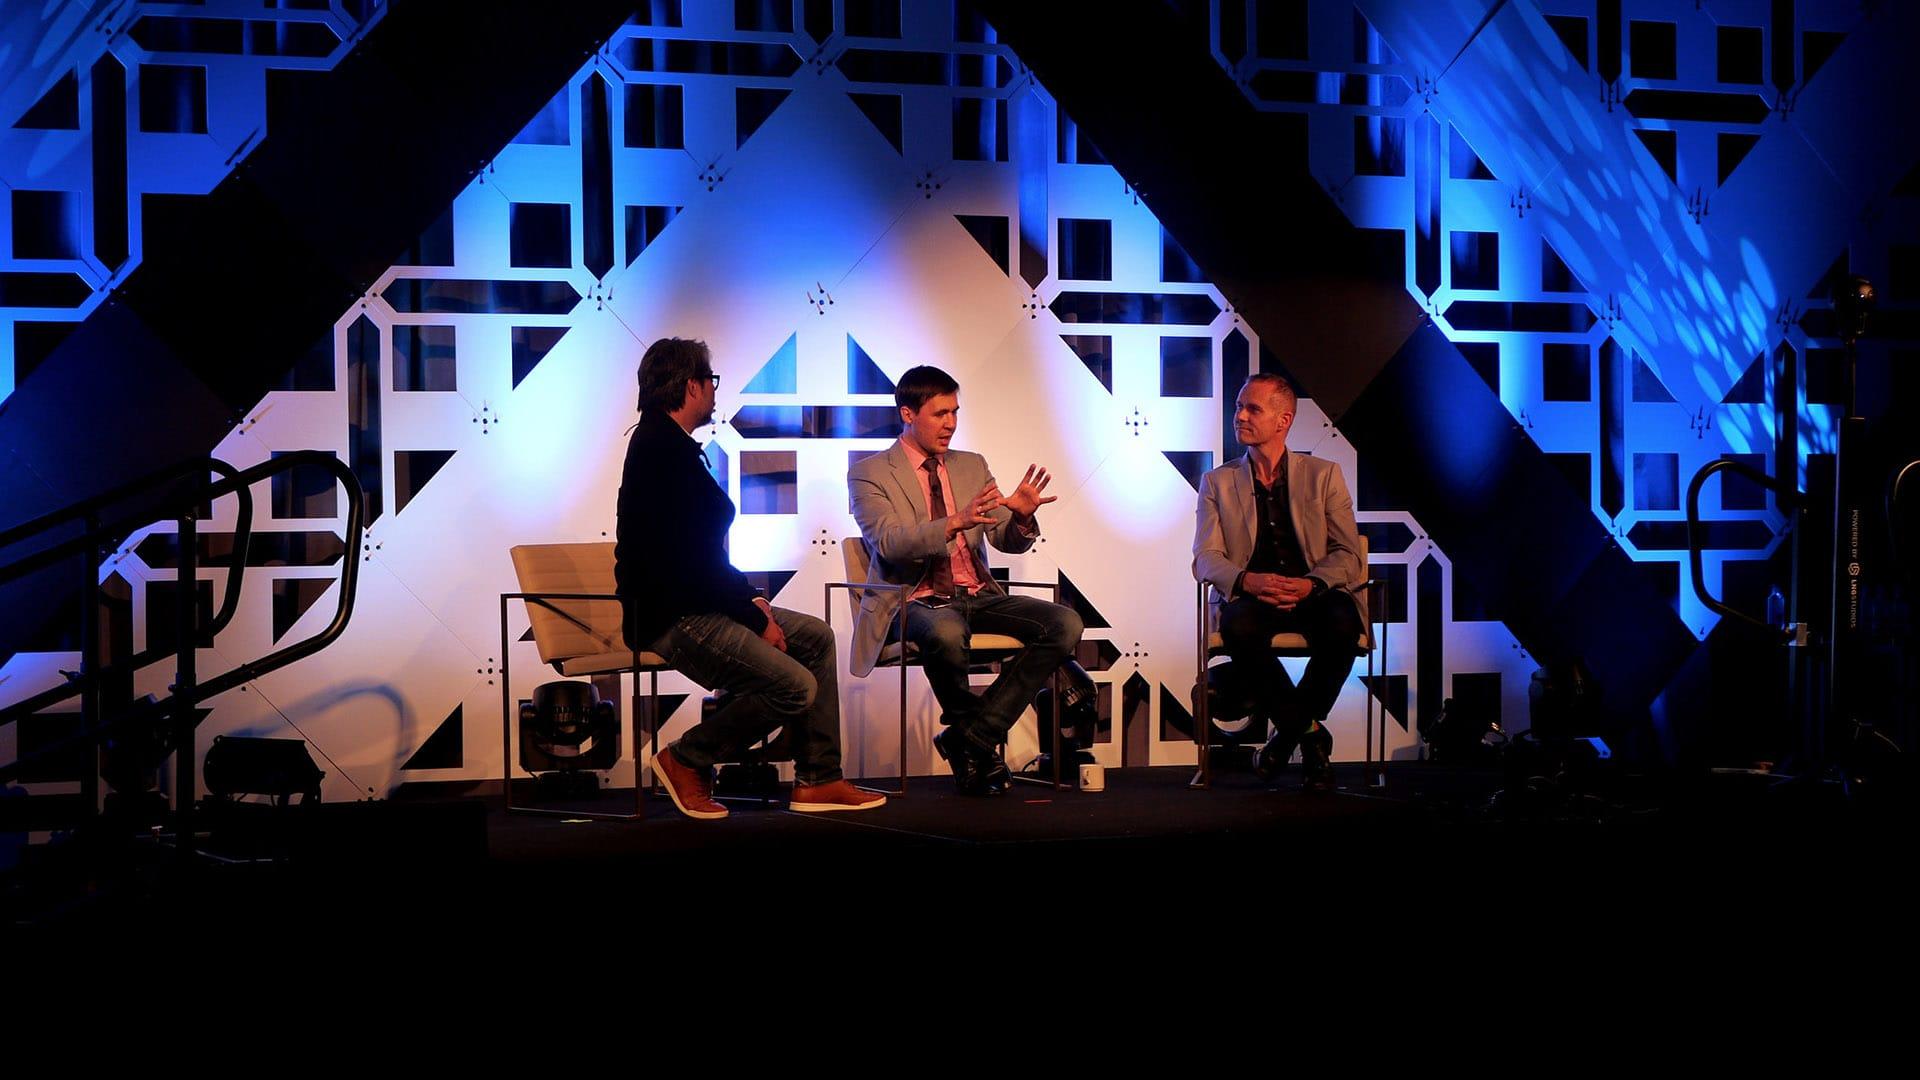 AR-VR-Conference-Vancouver_Serjan-Burlak_Wilson-Tang_Alan-Smithson_8